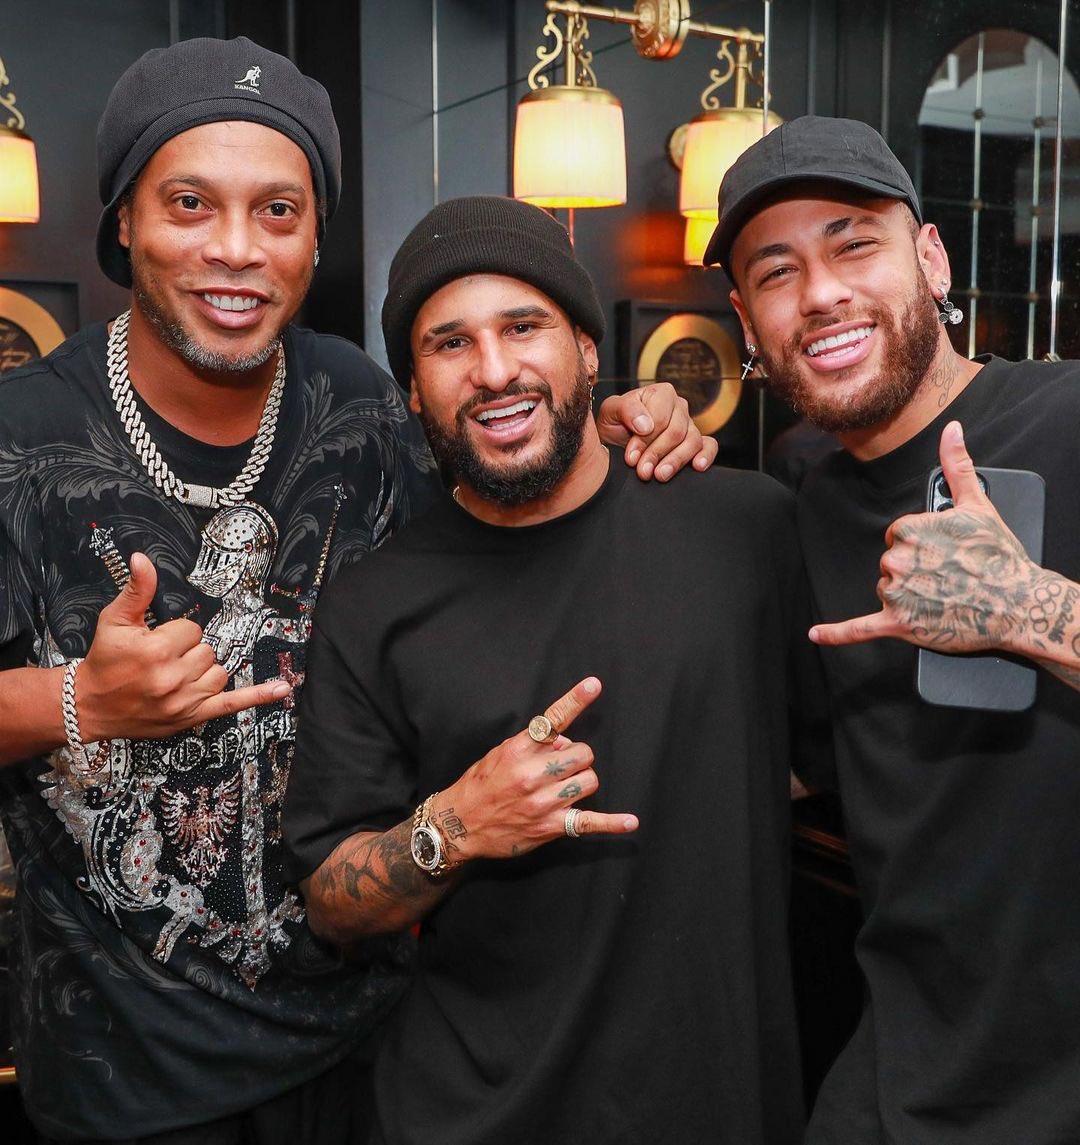 @neymarjrdepre's photo on Ronaldinho